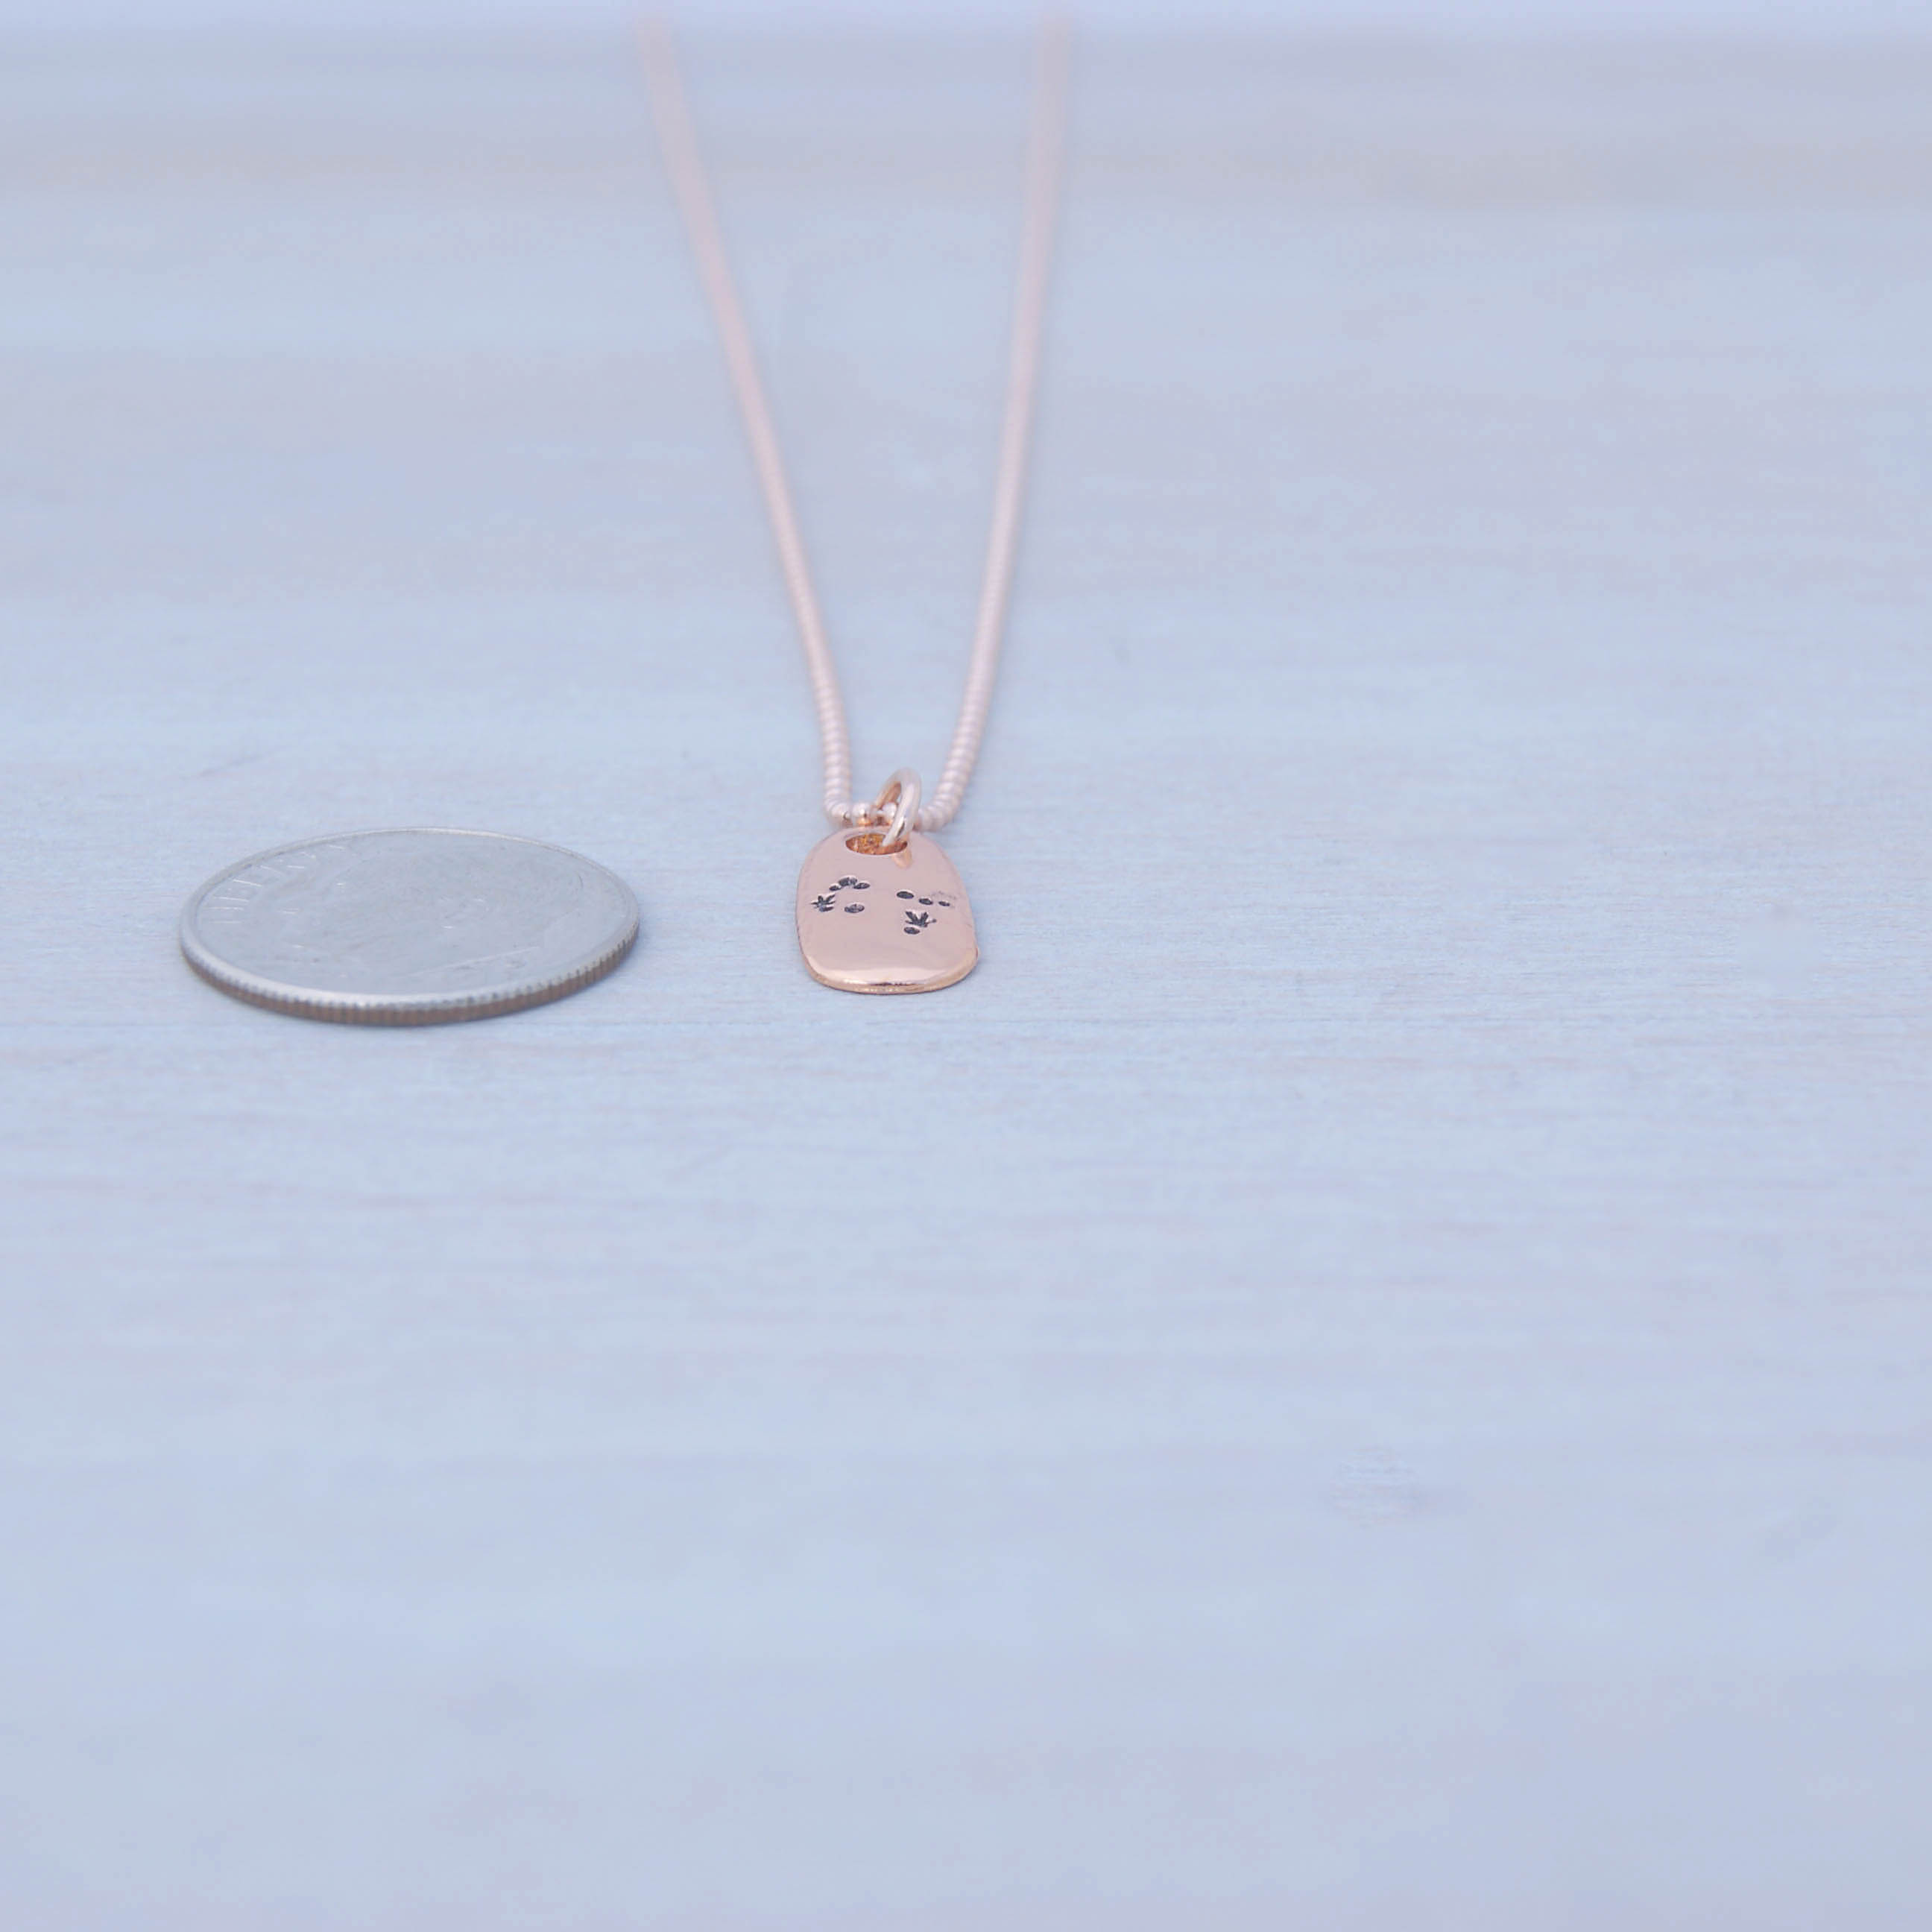 Gemini Zodiac Constellation Necklace in Rose Gold